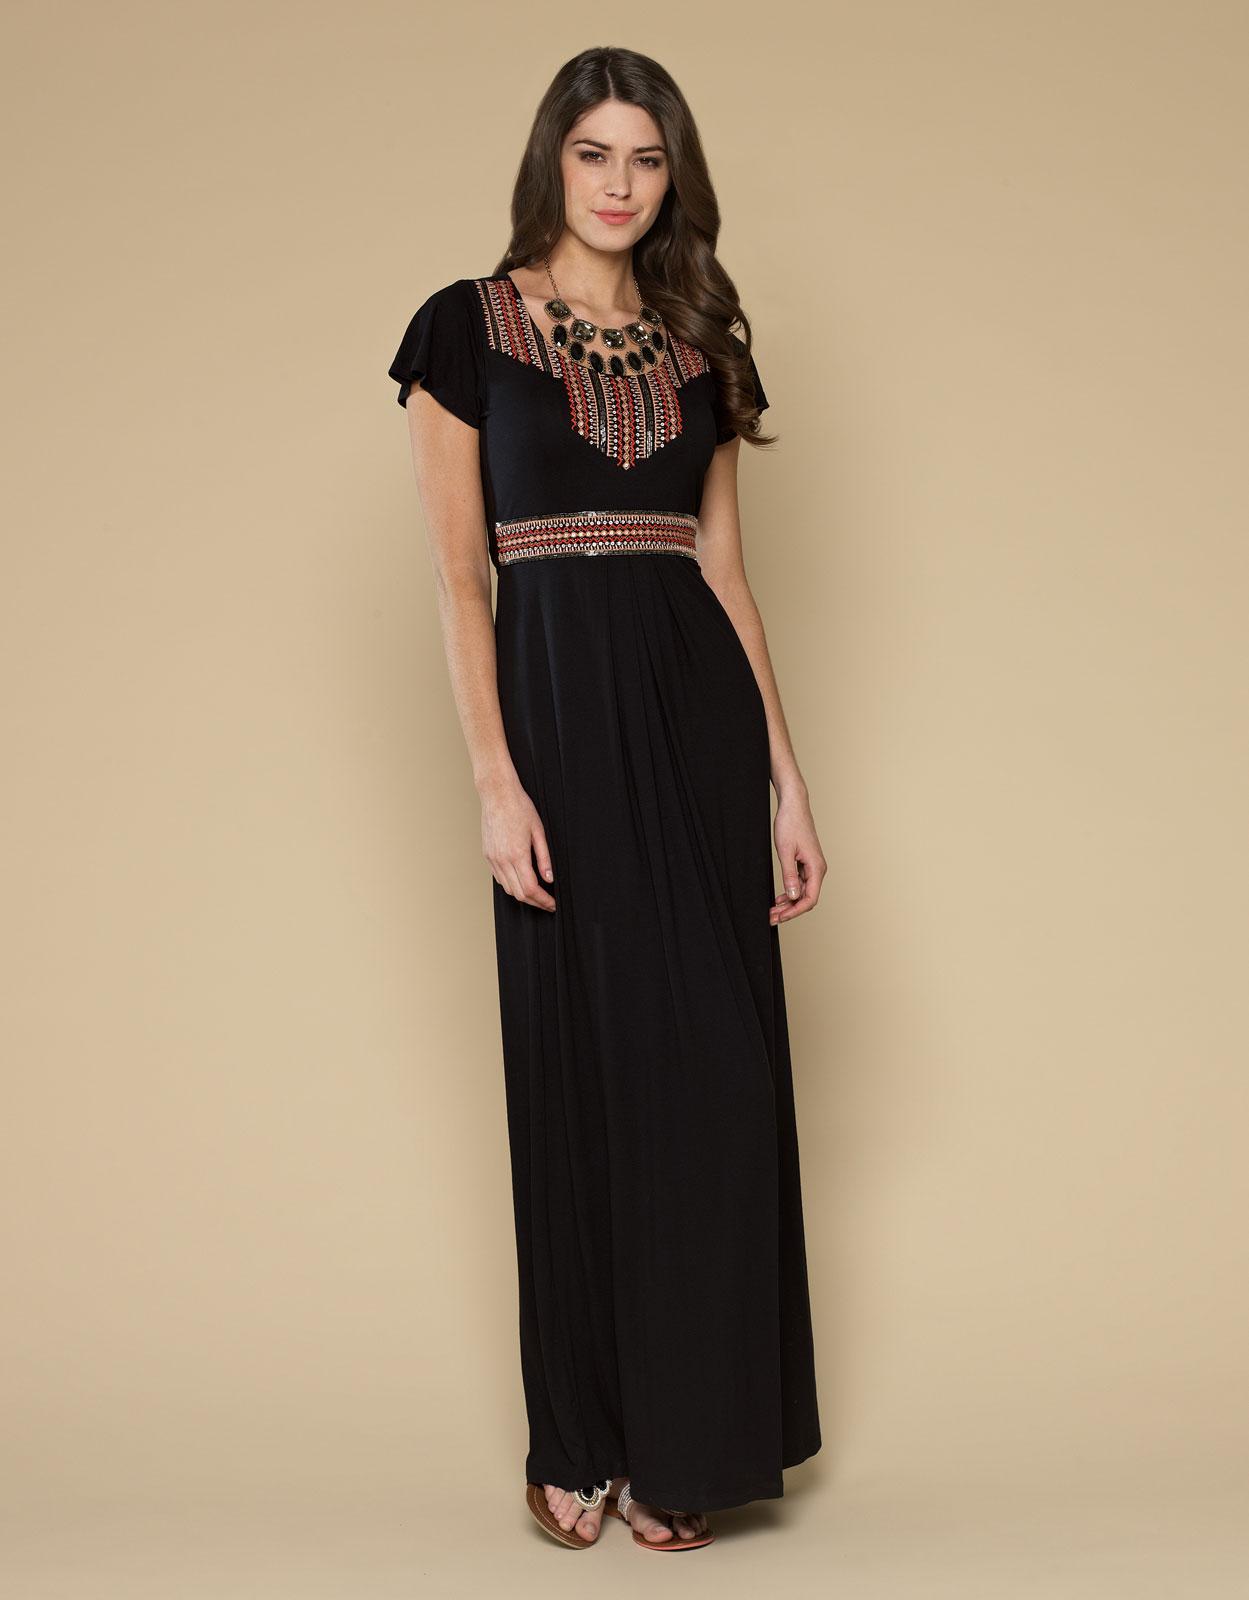 Petite Maxi Dresses Dressedupgirl Com